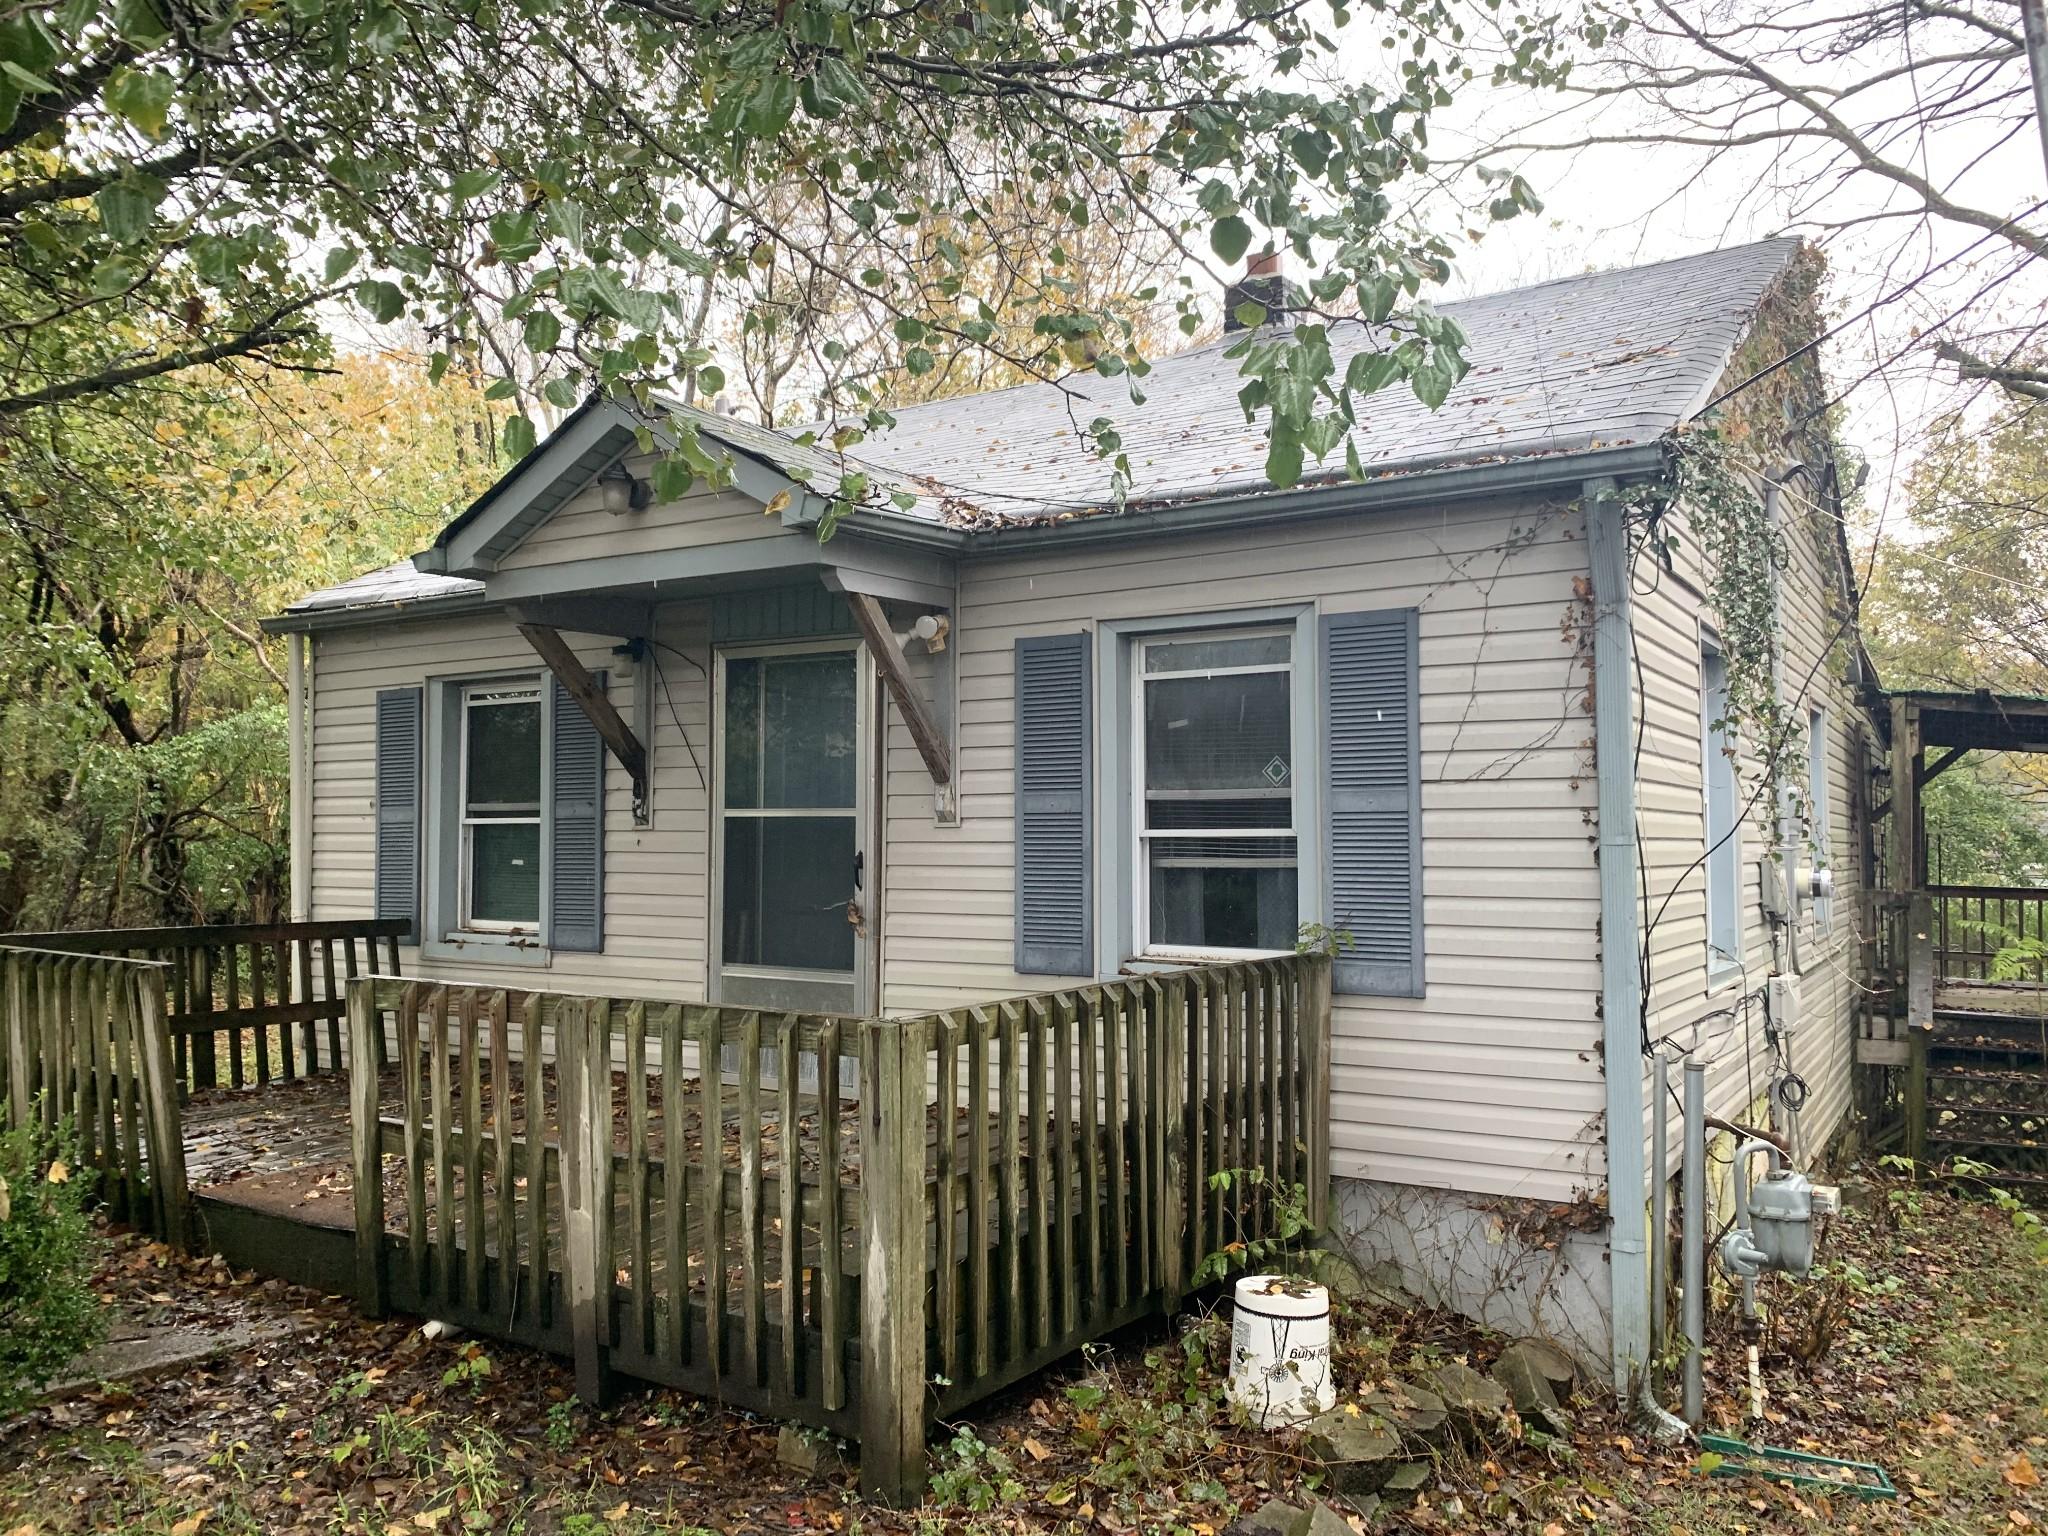 1226 Daniel St, Clarksville, TN 37040 - Clarksville, TN real estate listing